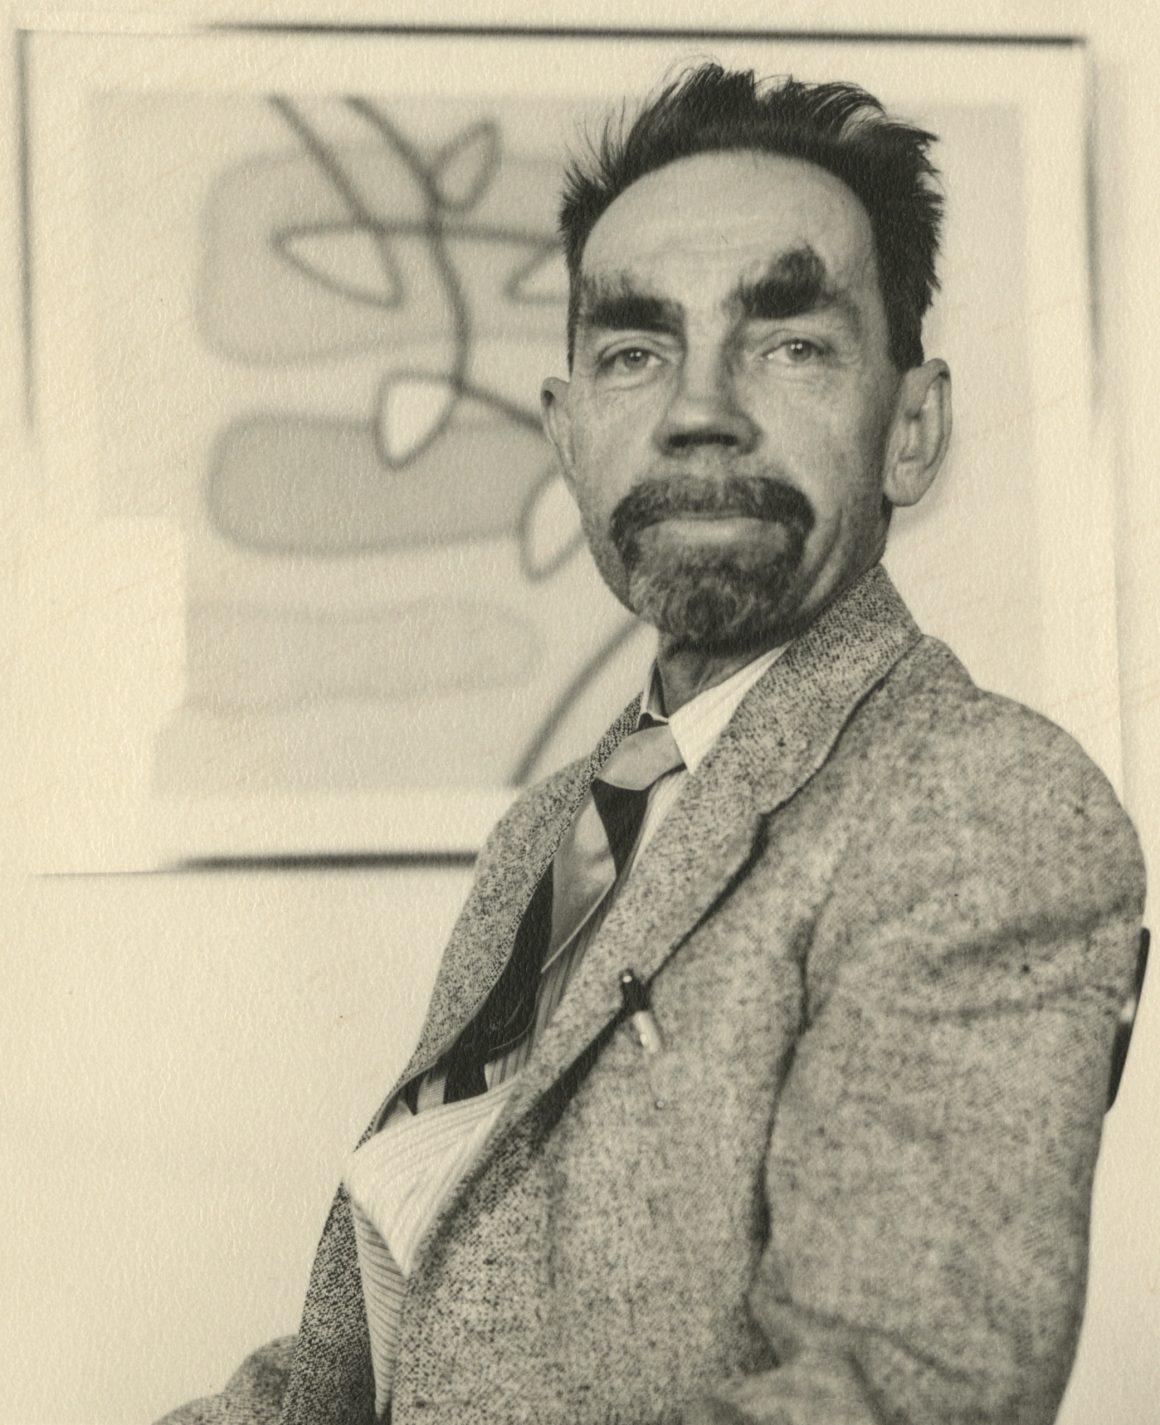 Photograph of artist Raymond Jonson in 1950.